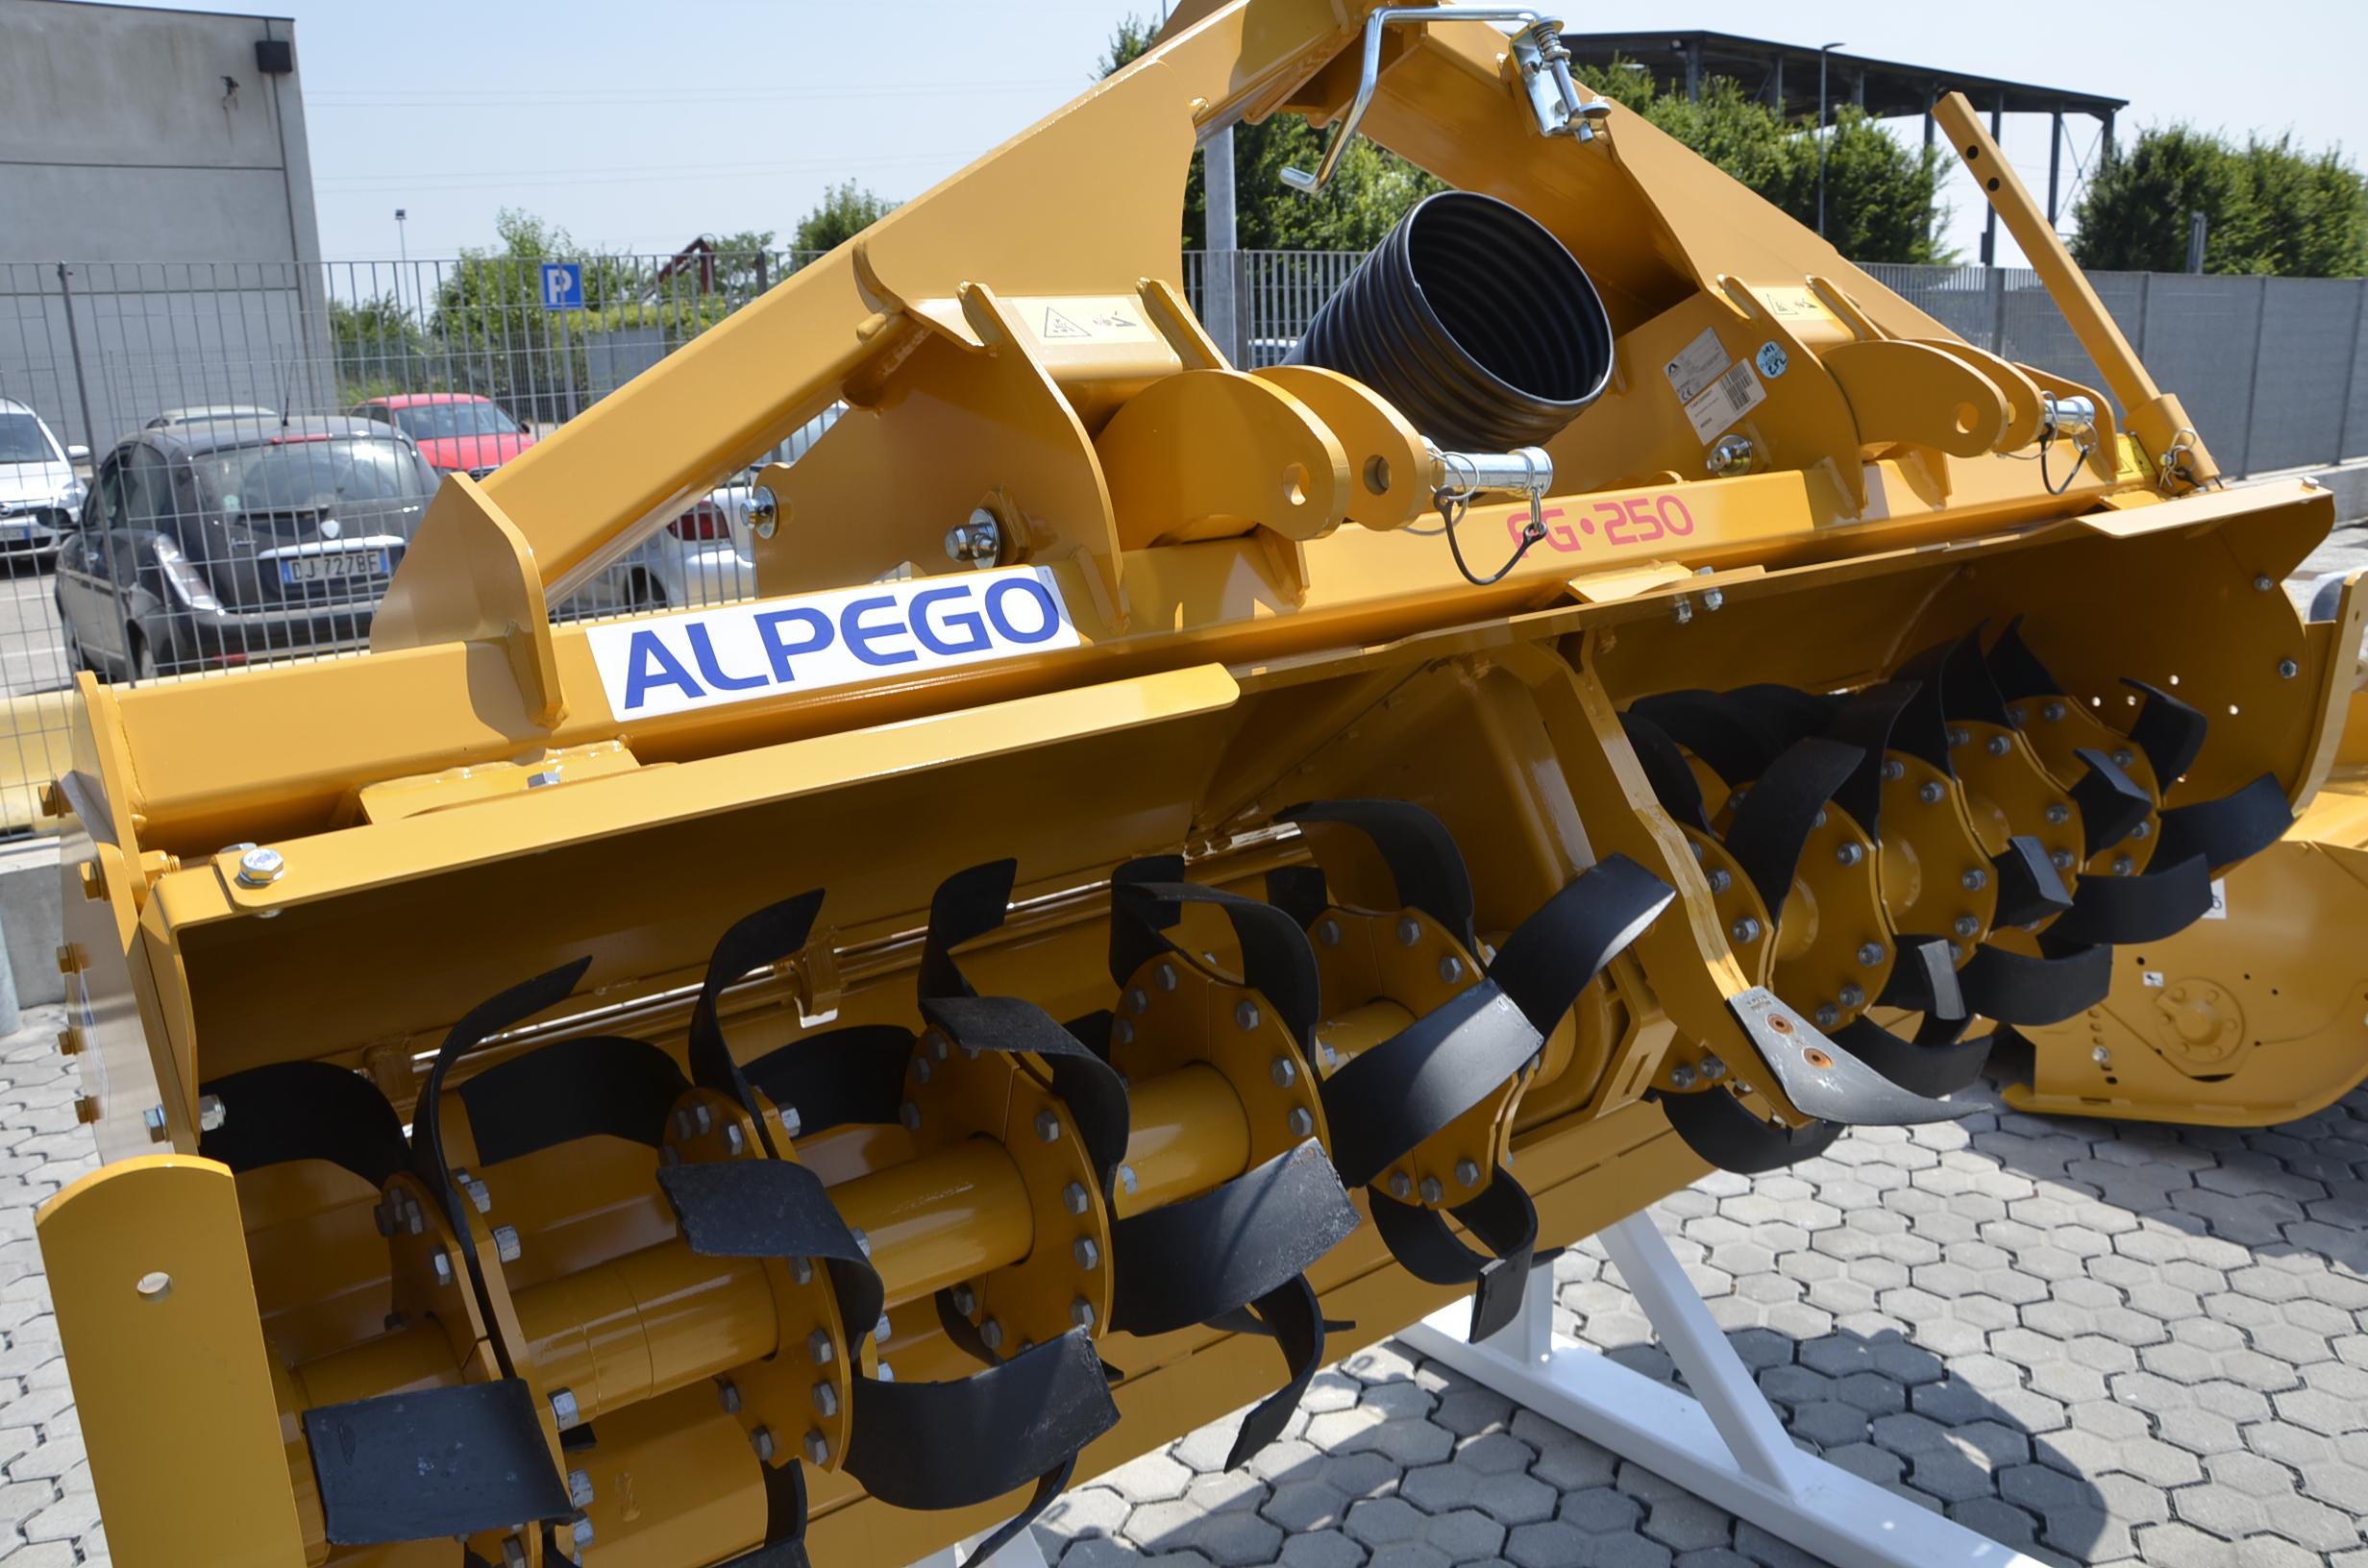 Alpego_7-25